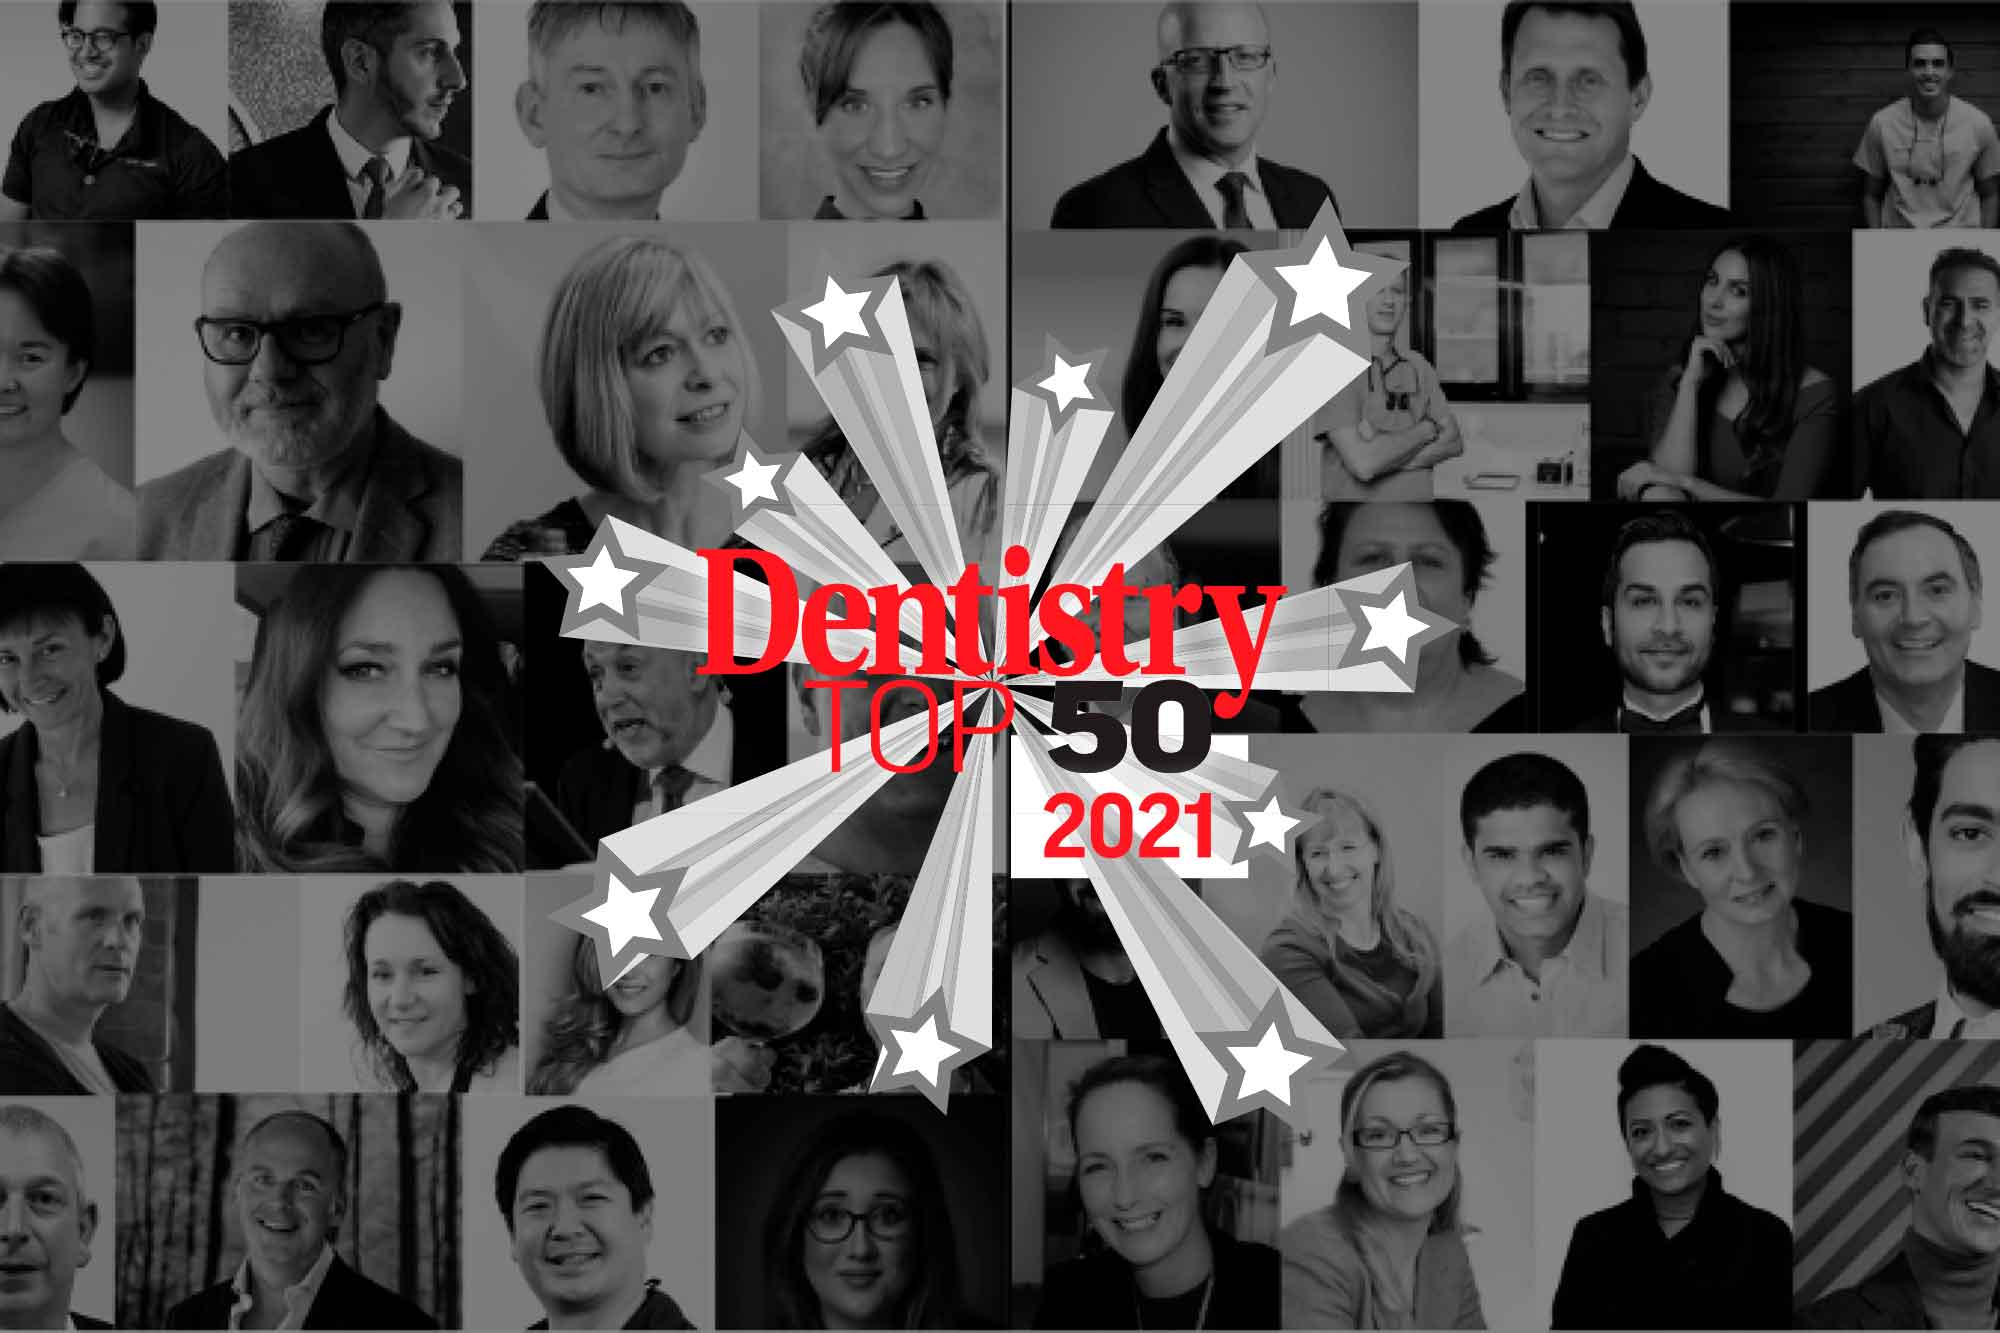 Dentistry Top 50 2021